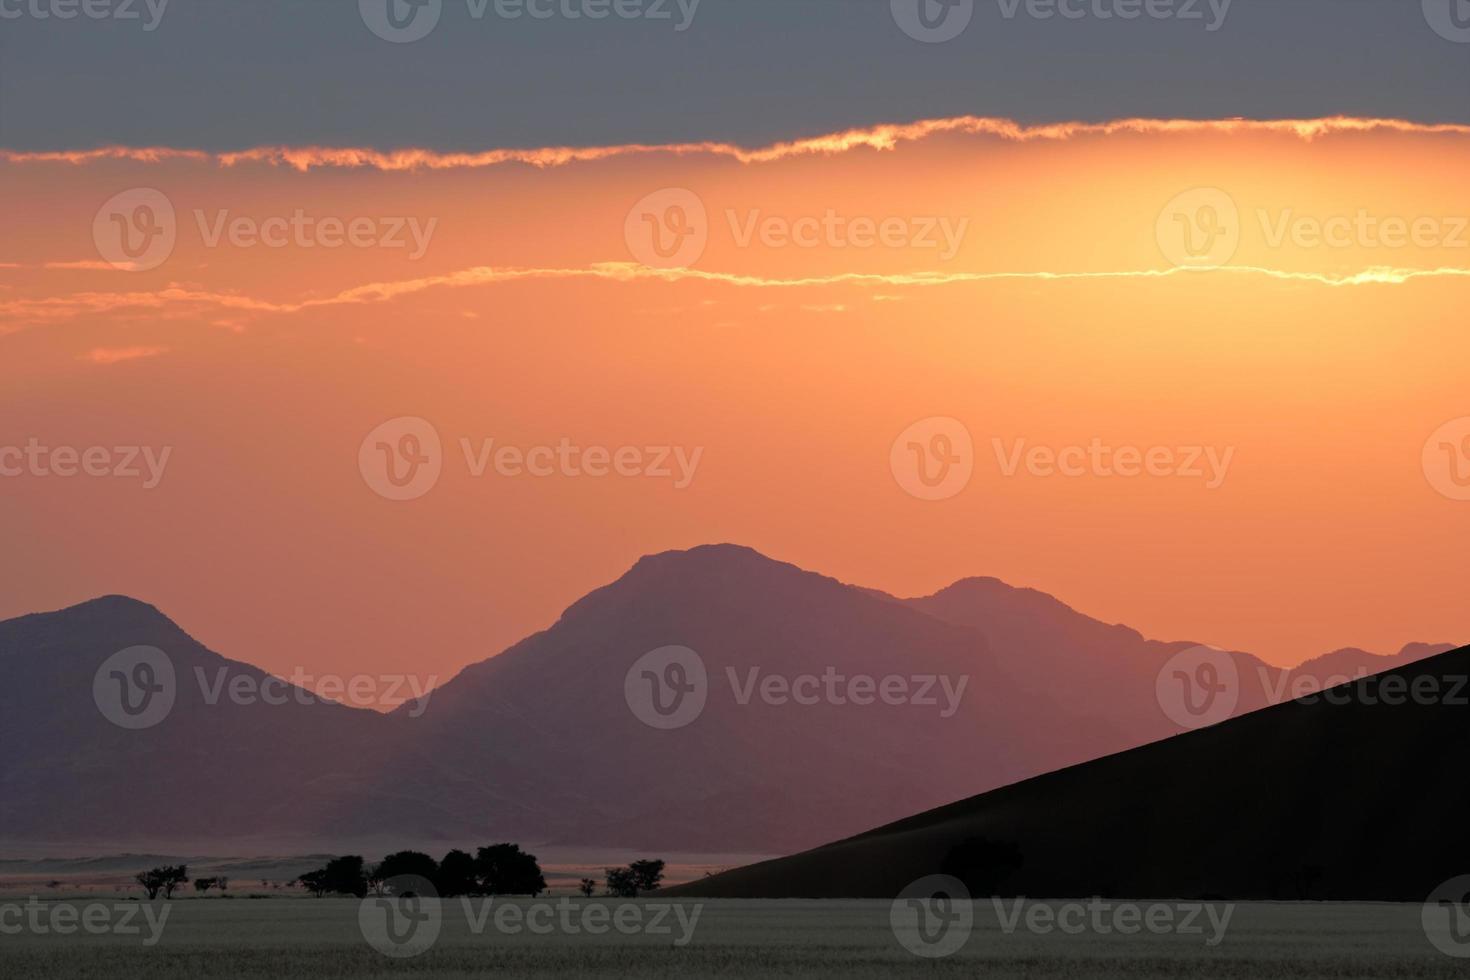 woestijn zonsopgang foto